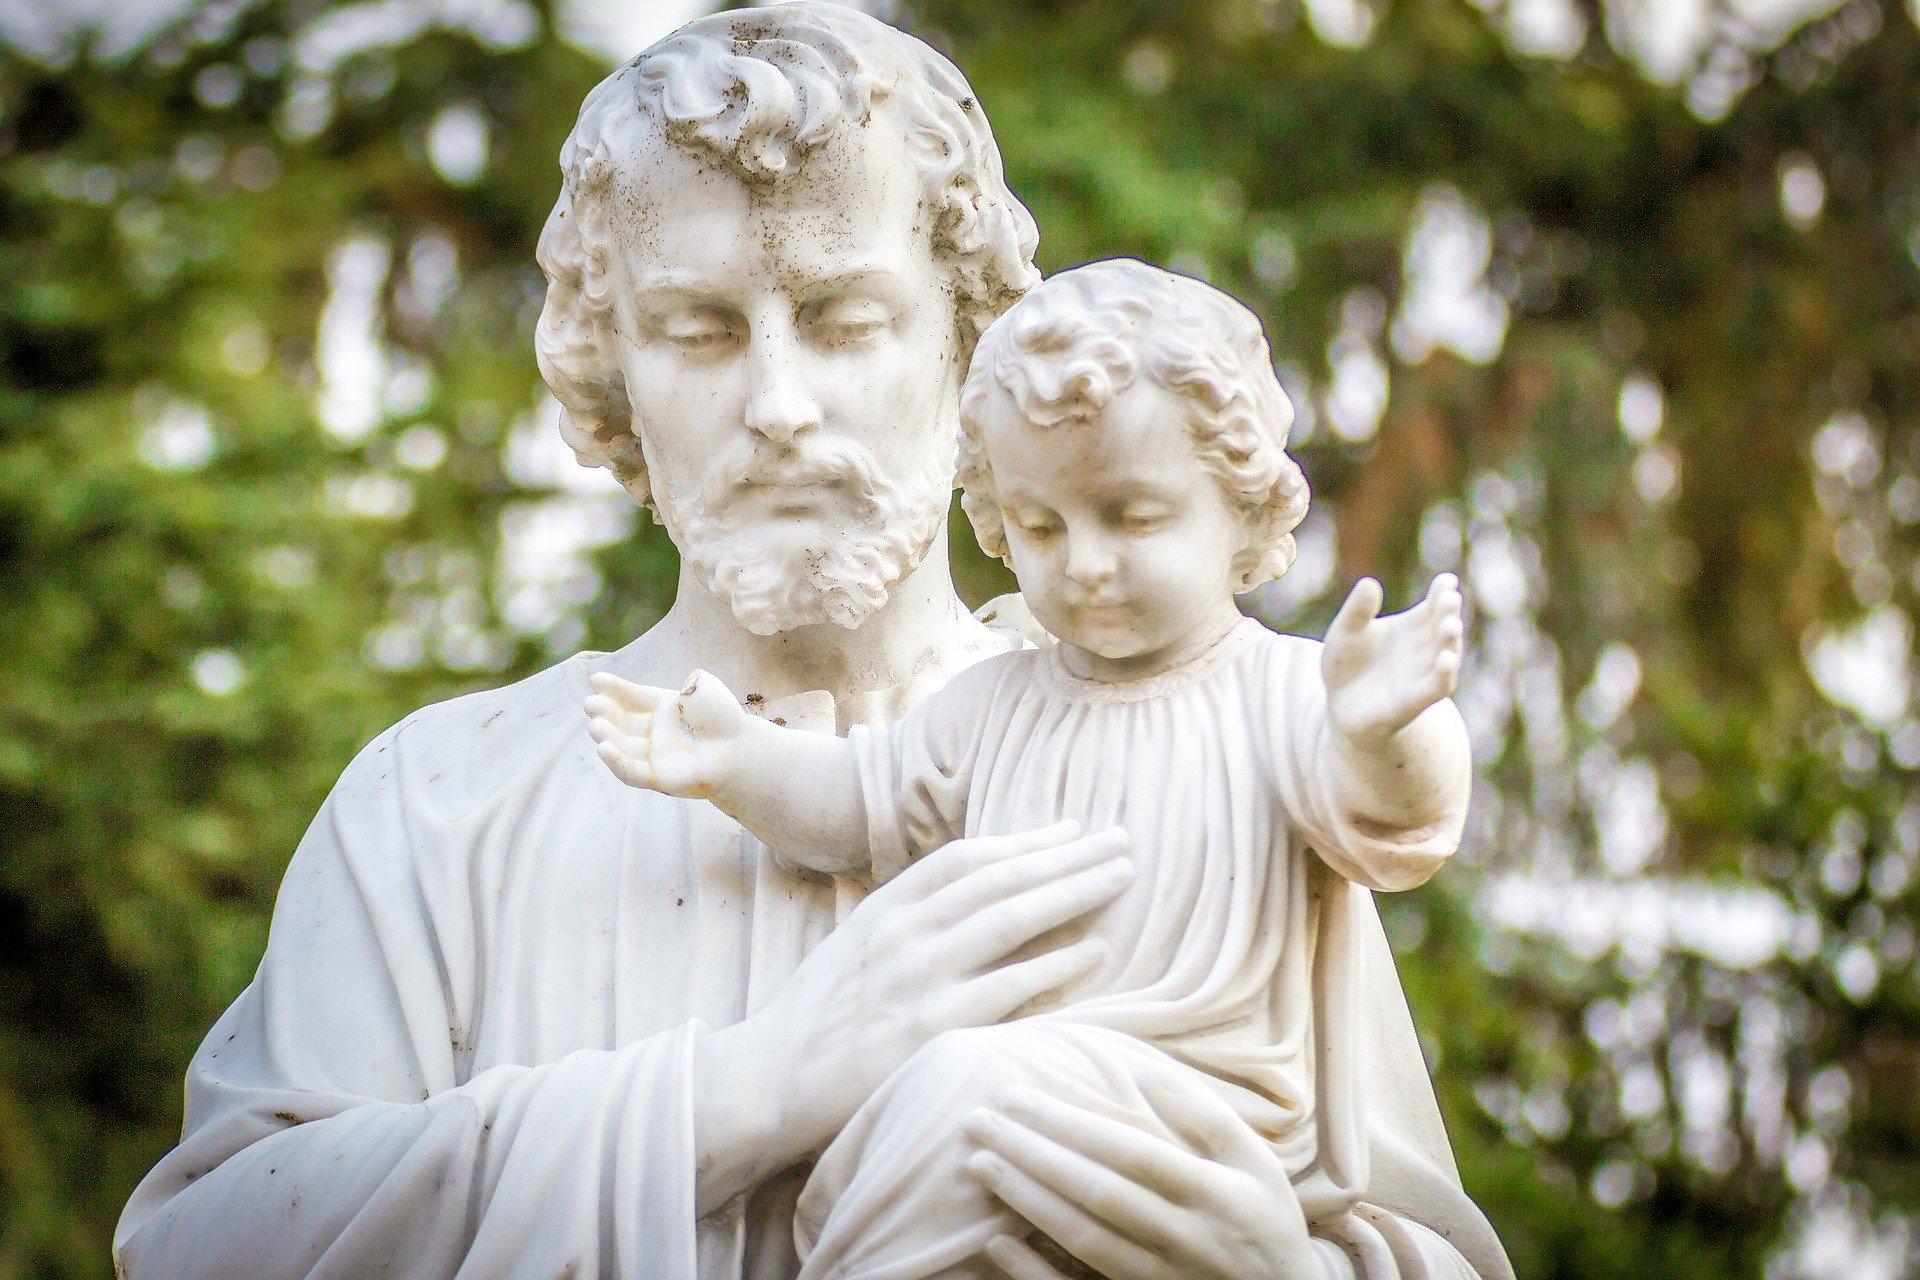 saint joseph statue, holding baby jesus